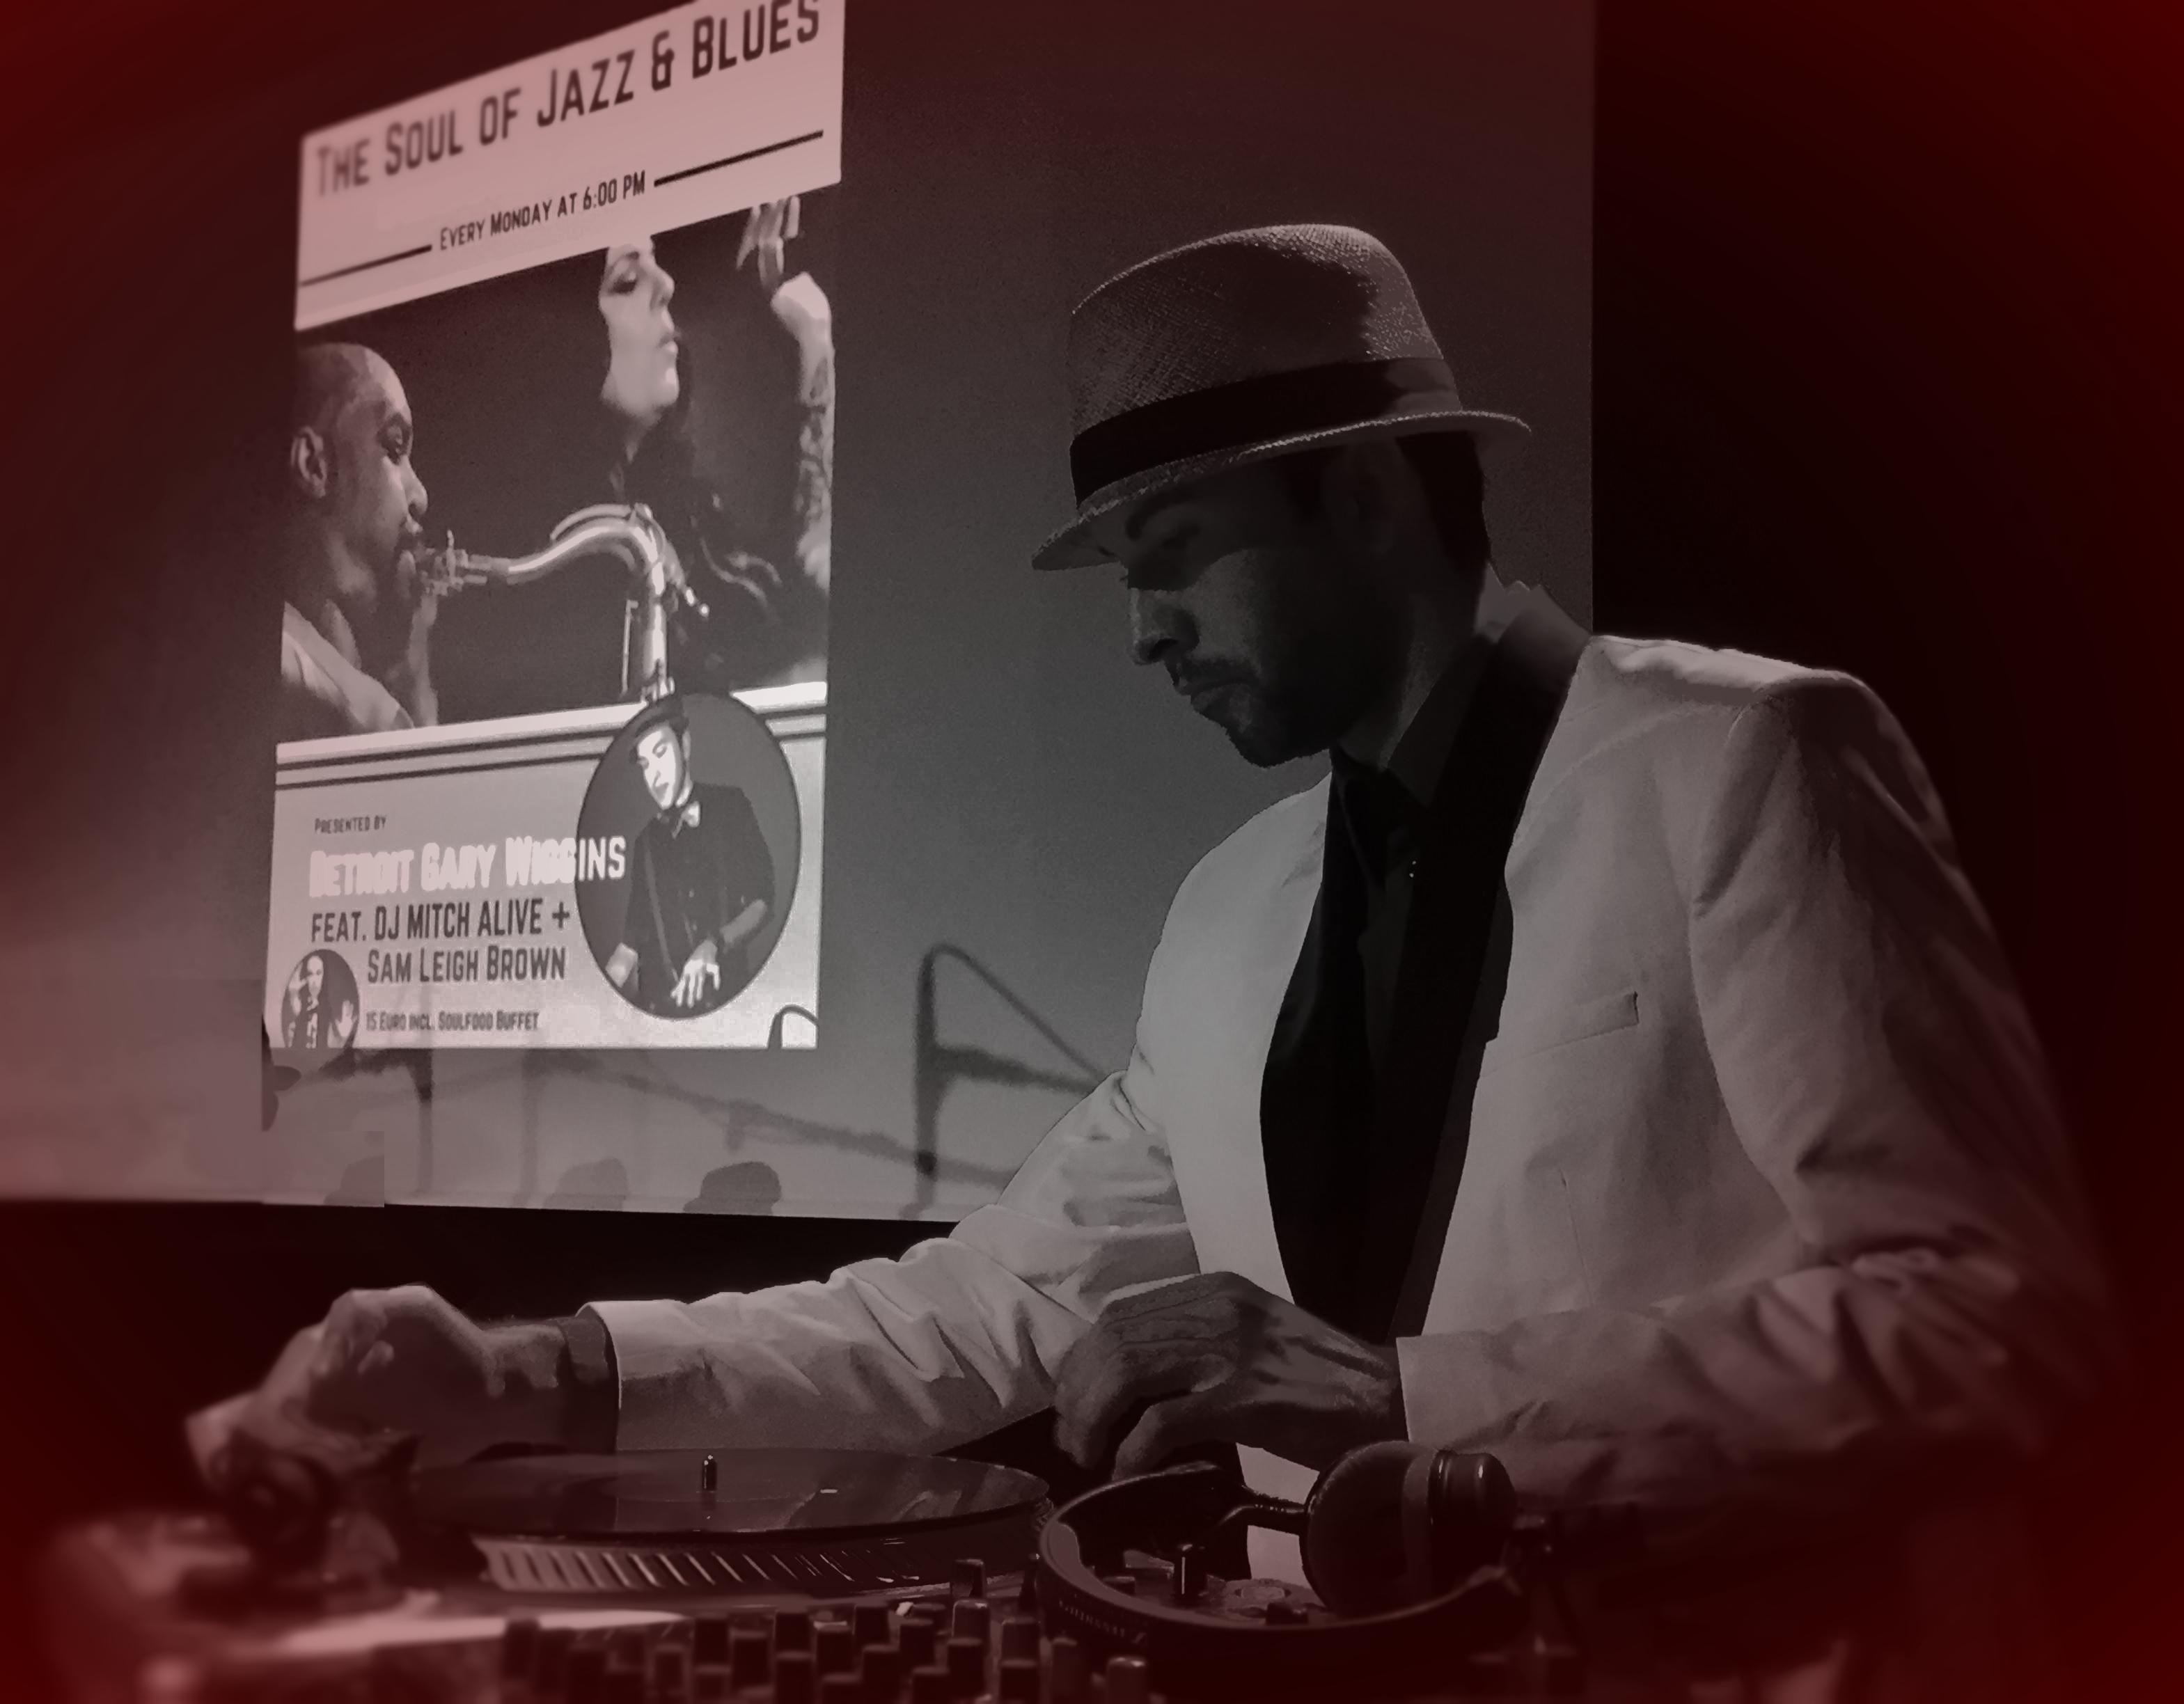 DJ MITCH ALIVE at RED BALLROOM